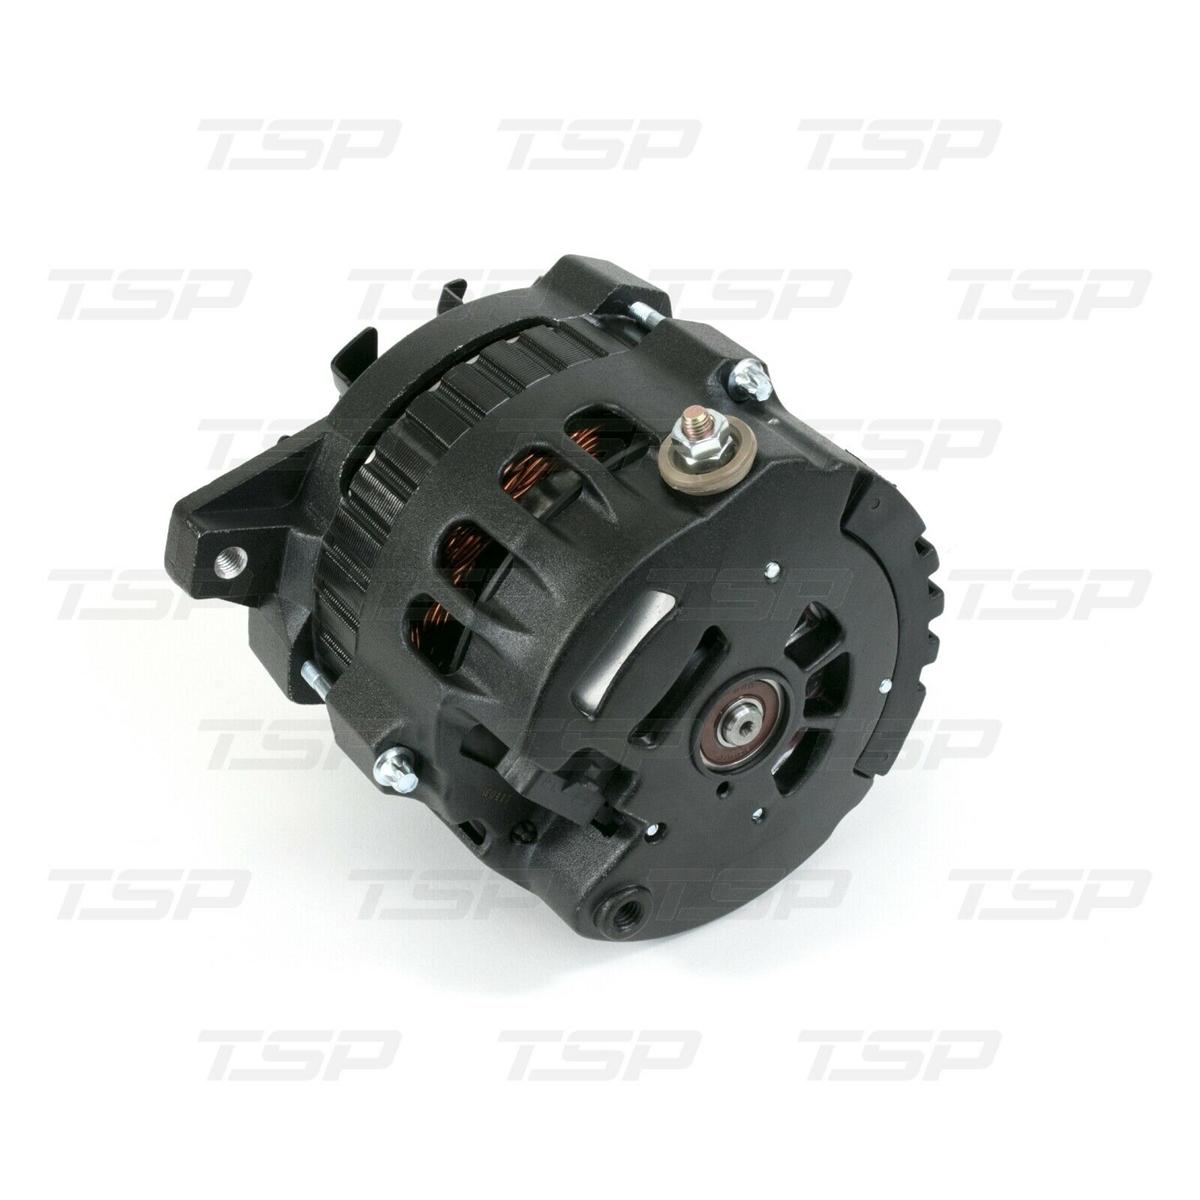 Gm Cs130 Style 160 Amp Alternator With Serpentine Pulley Black